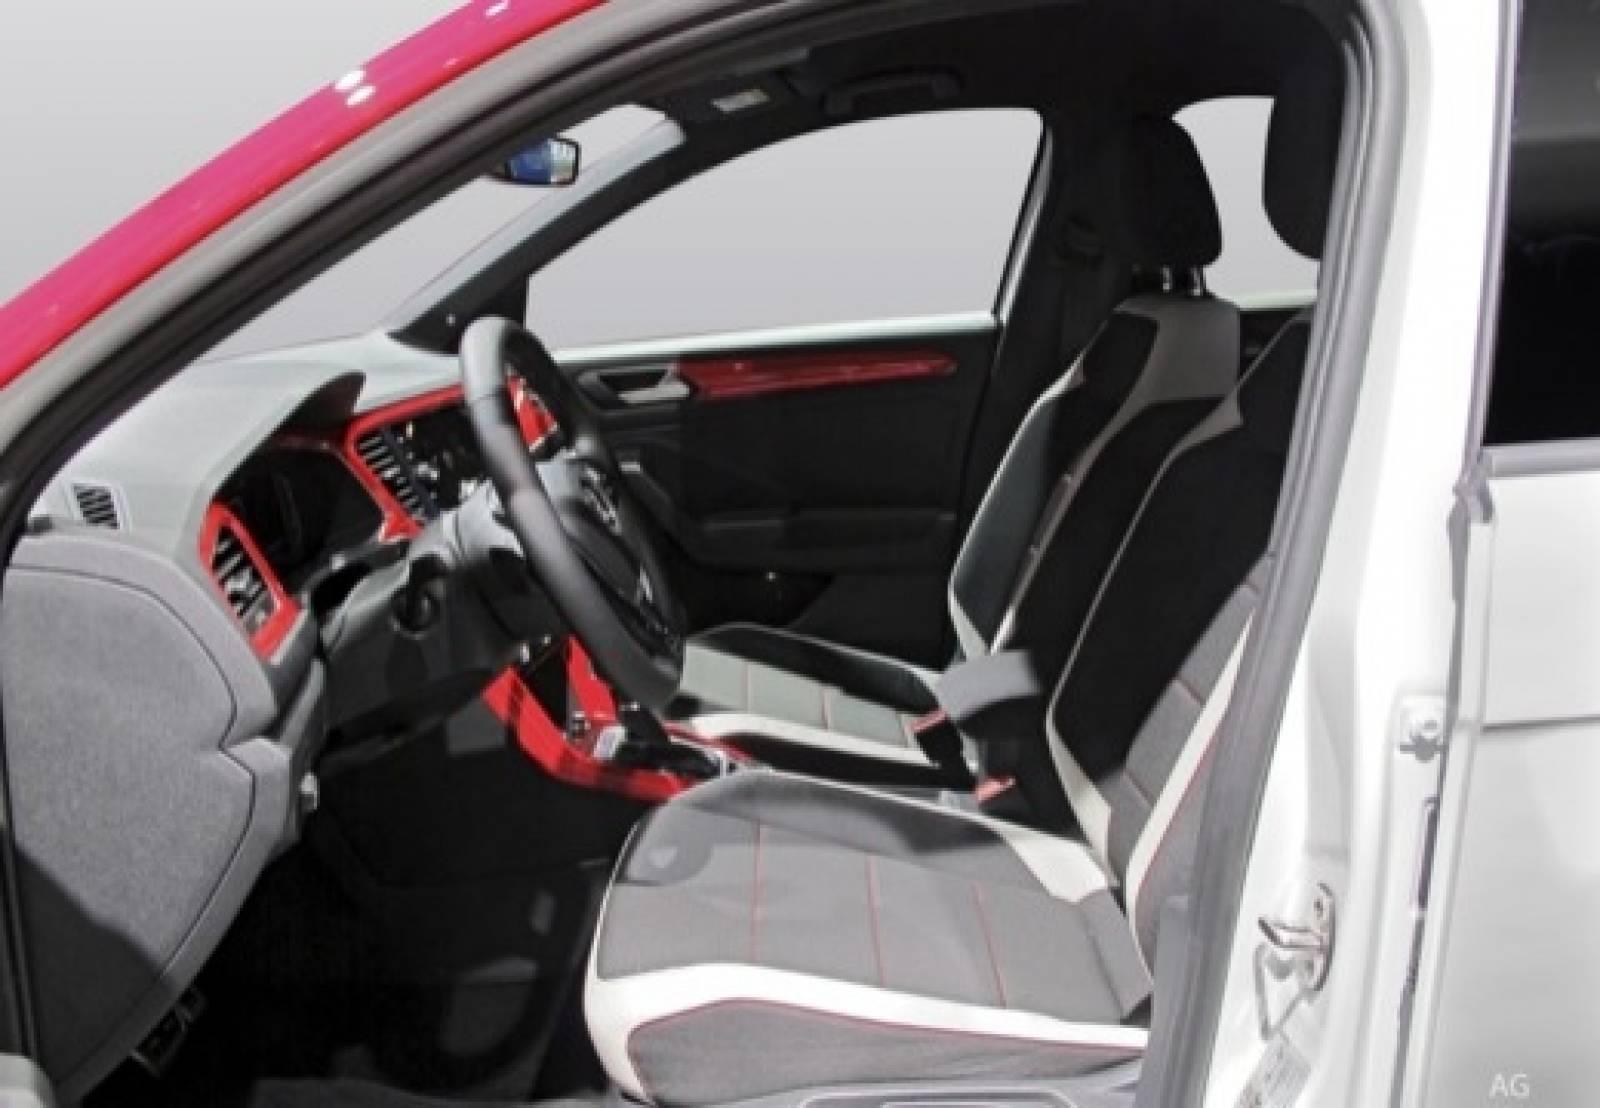 VOLKSWAGEN T-Roc 1.5 TSI 150 EVO Start/Stop DSG7 - véhicule neuf - LEMAUVIEL AUTOMOBILES - Présentation site web V2 - Lemauviel Automobiles - VIRE - 14500 - VIRE - 7